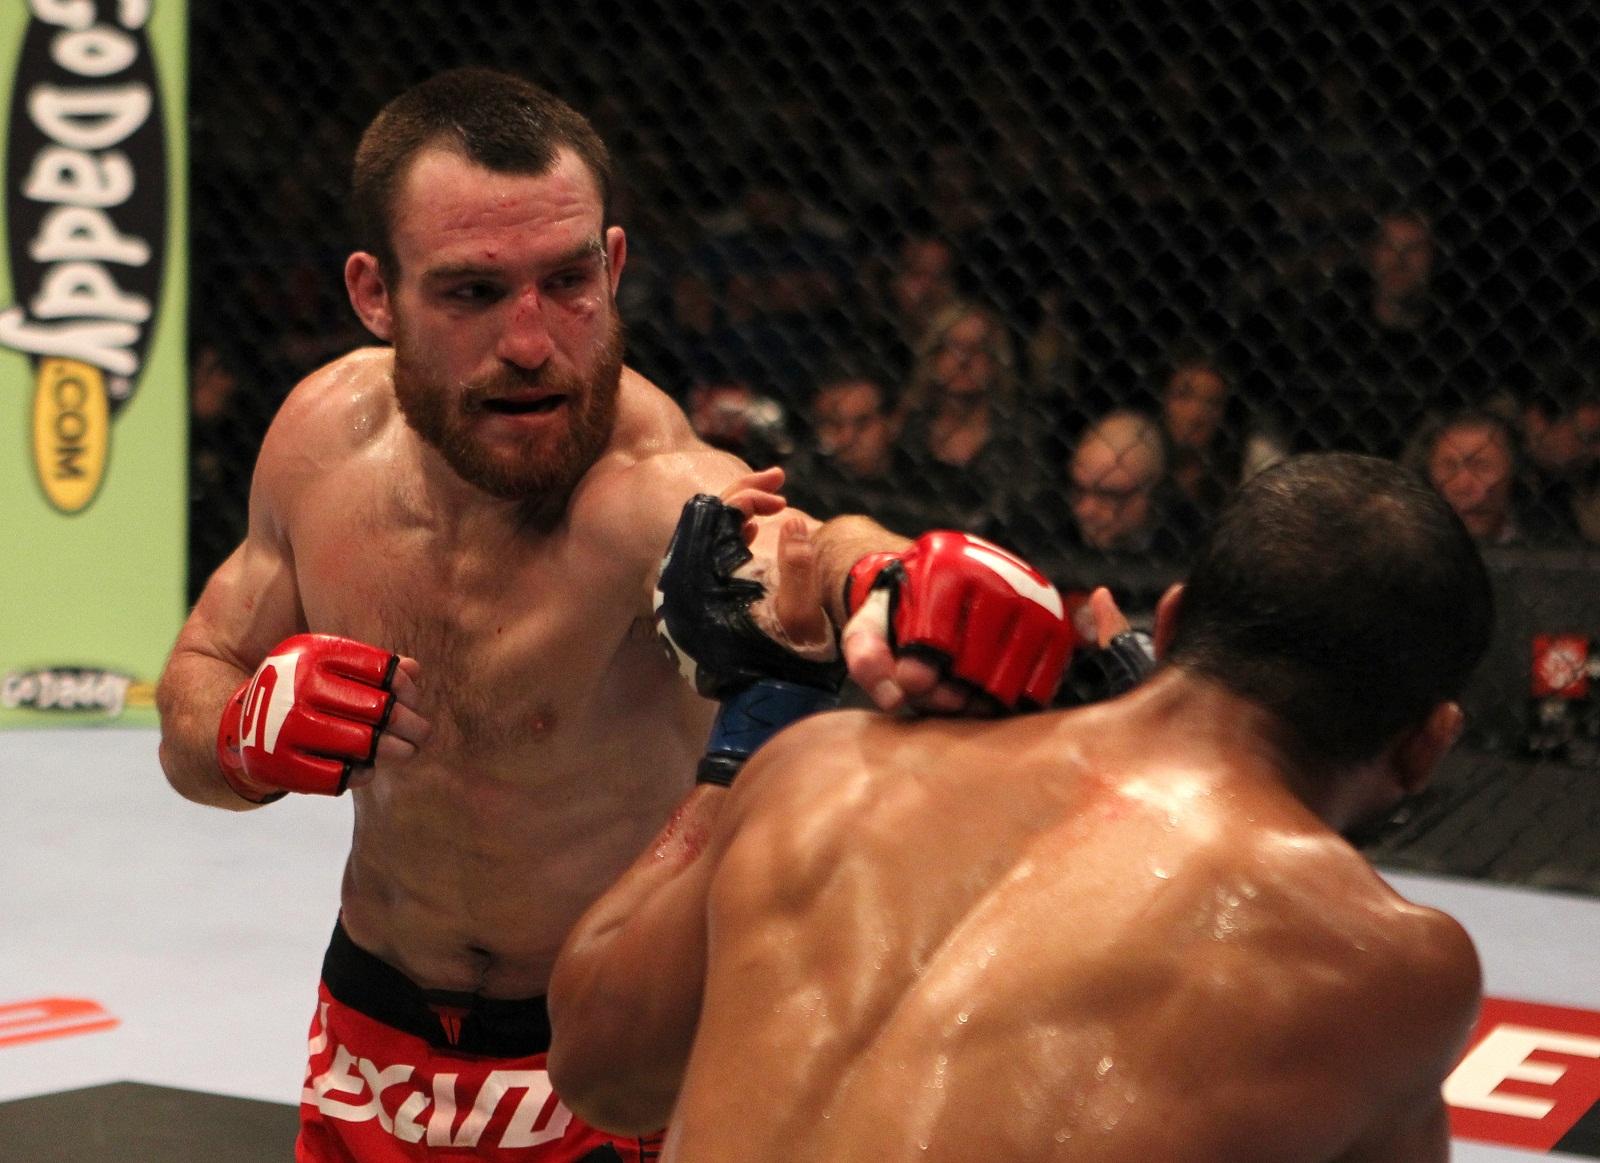 Strikeforce lightweight Pat Healy